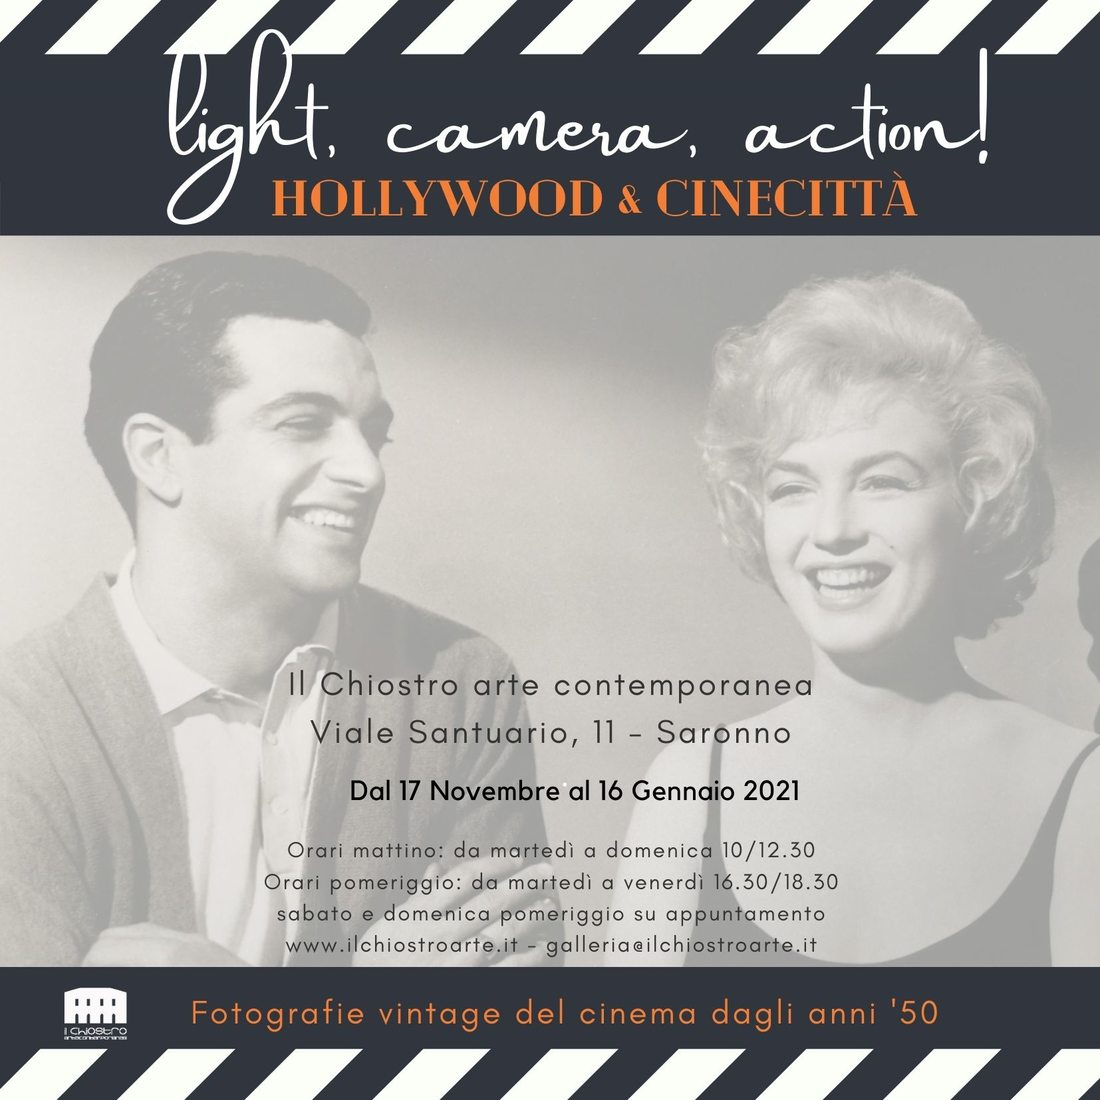 Light, camera, action! Hollywood & Cinecittà